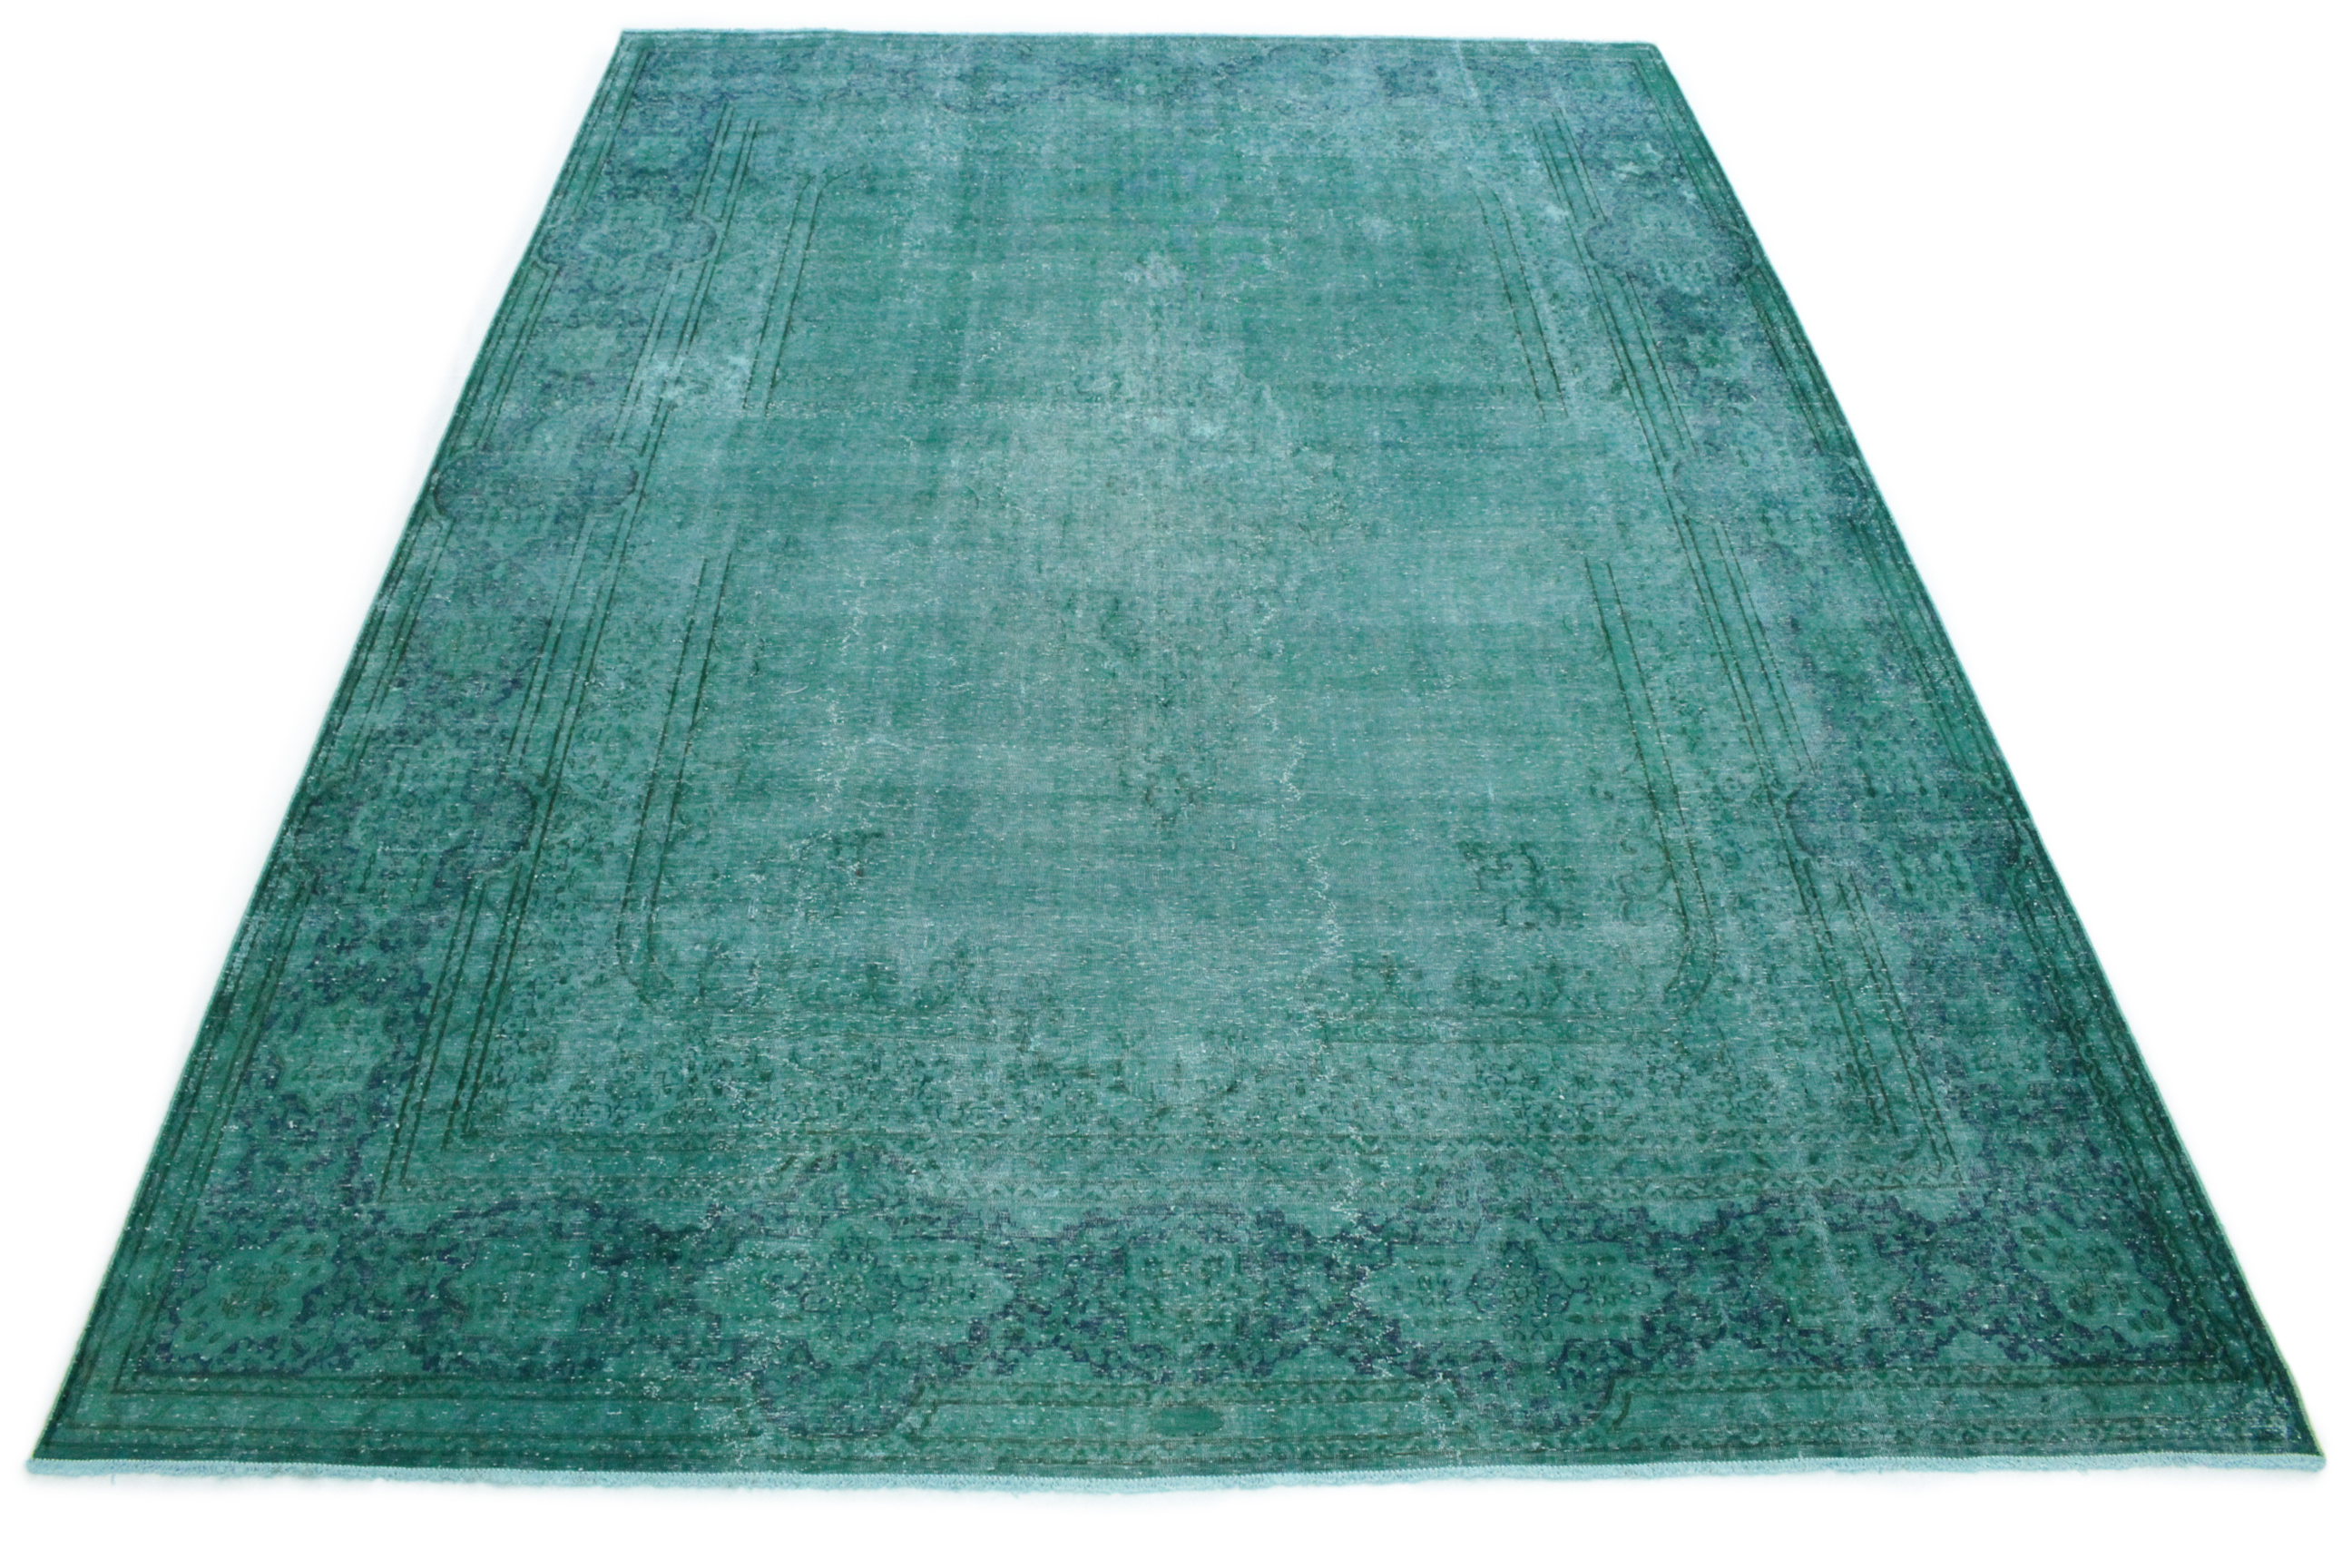 vintage teppich t rkis in 430x300 1001 167155 bei kaufen. Black Bedroom Furniture Sets. Home Design Ideas